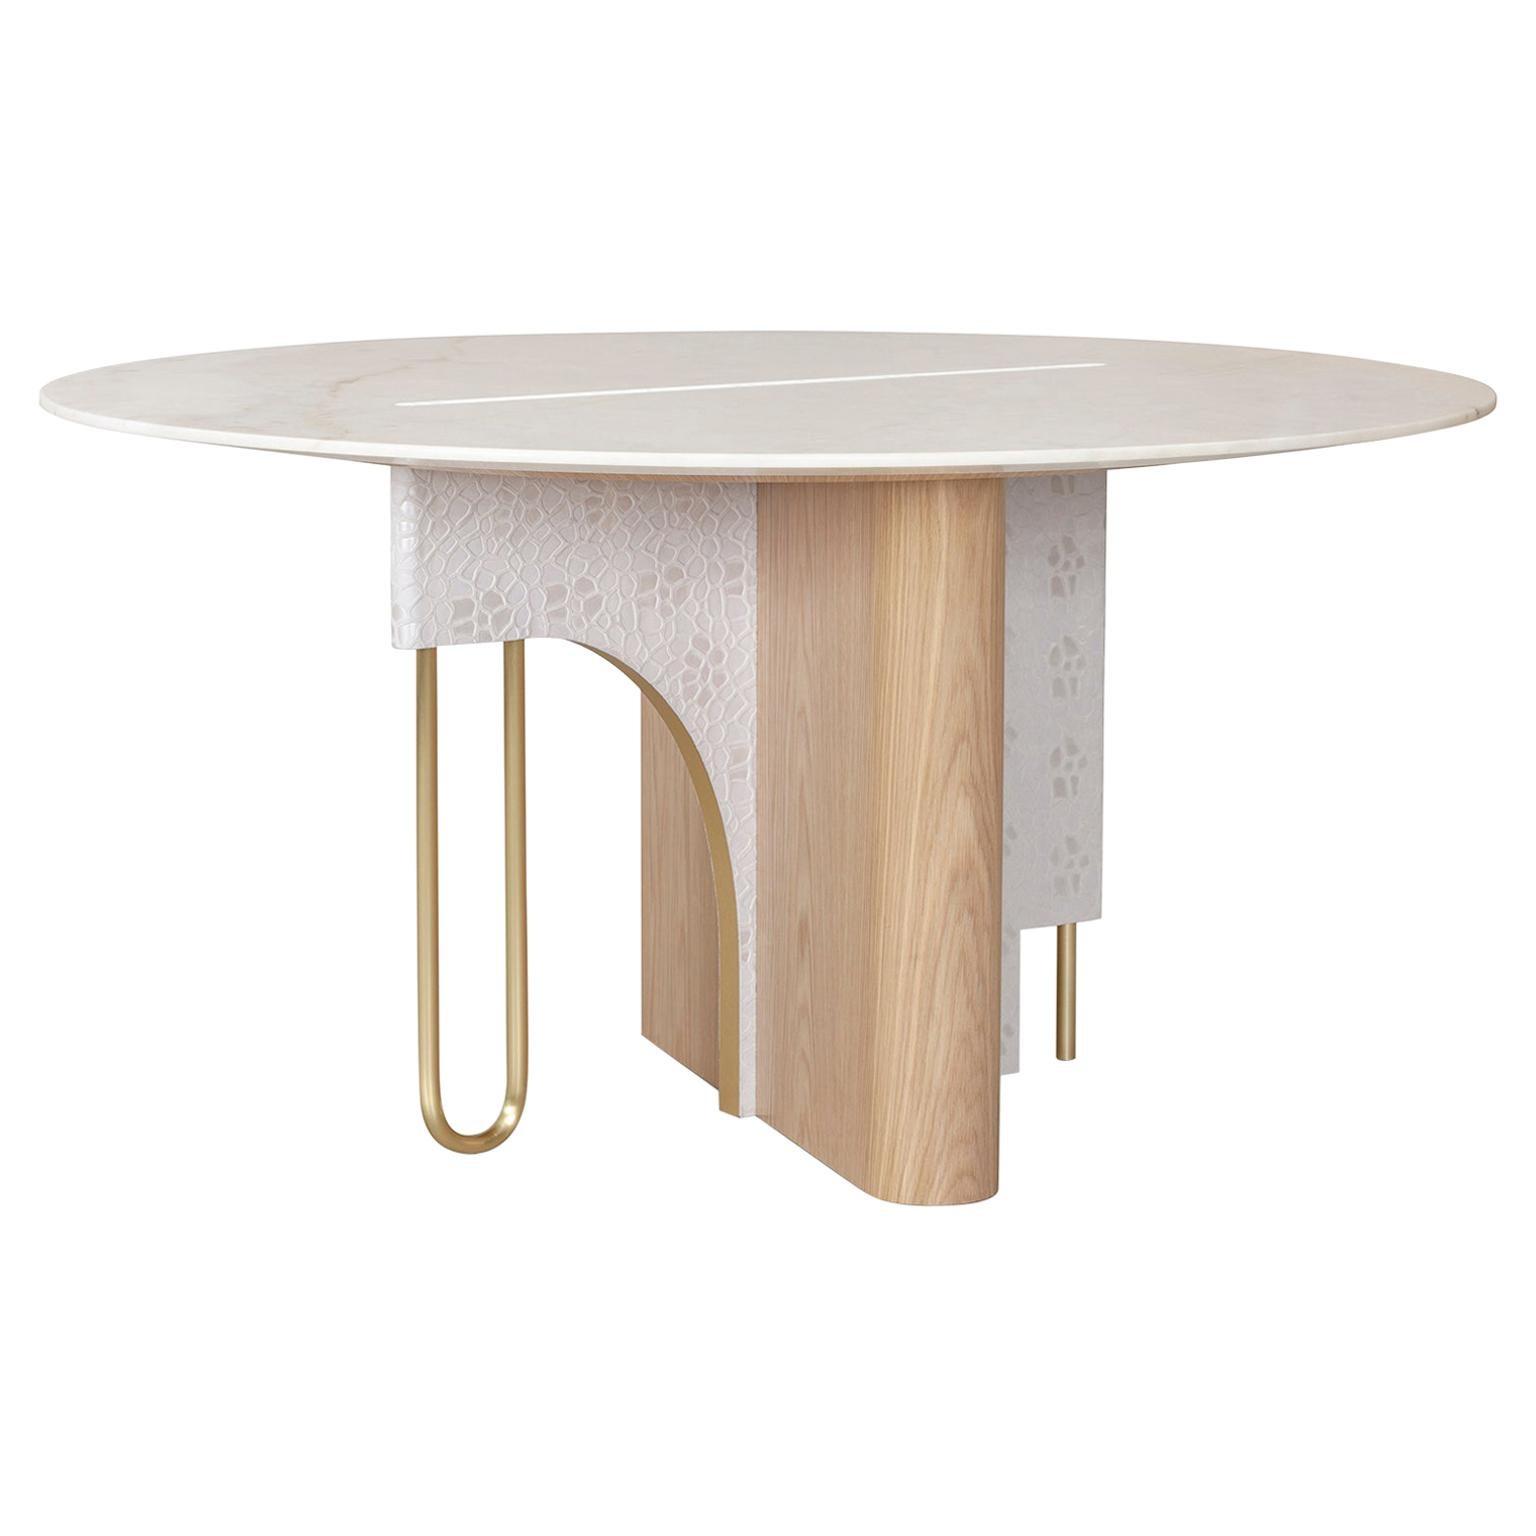 Ferreirinha 6-Seat Round Dining Table Calacatta Bianco Brushed Brass Oak Leather